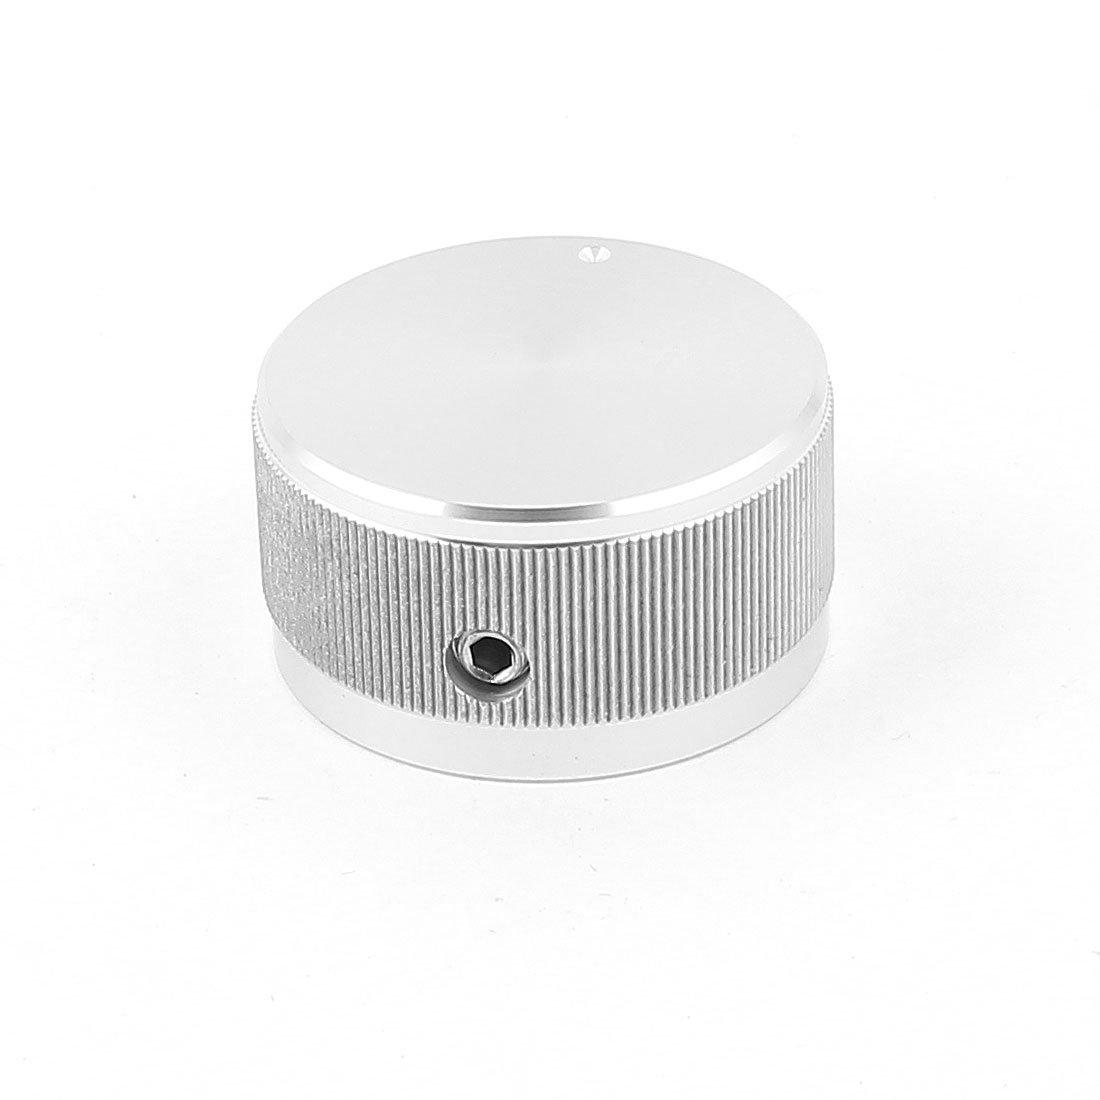 Aexit Silver Tone Security & Surveillance CNC Solid Aluminum HiFi Speaker Radio Volume Horns & Sirens Knobs 30x16mm